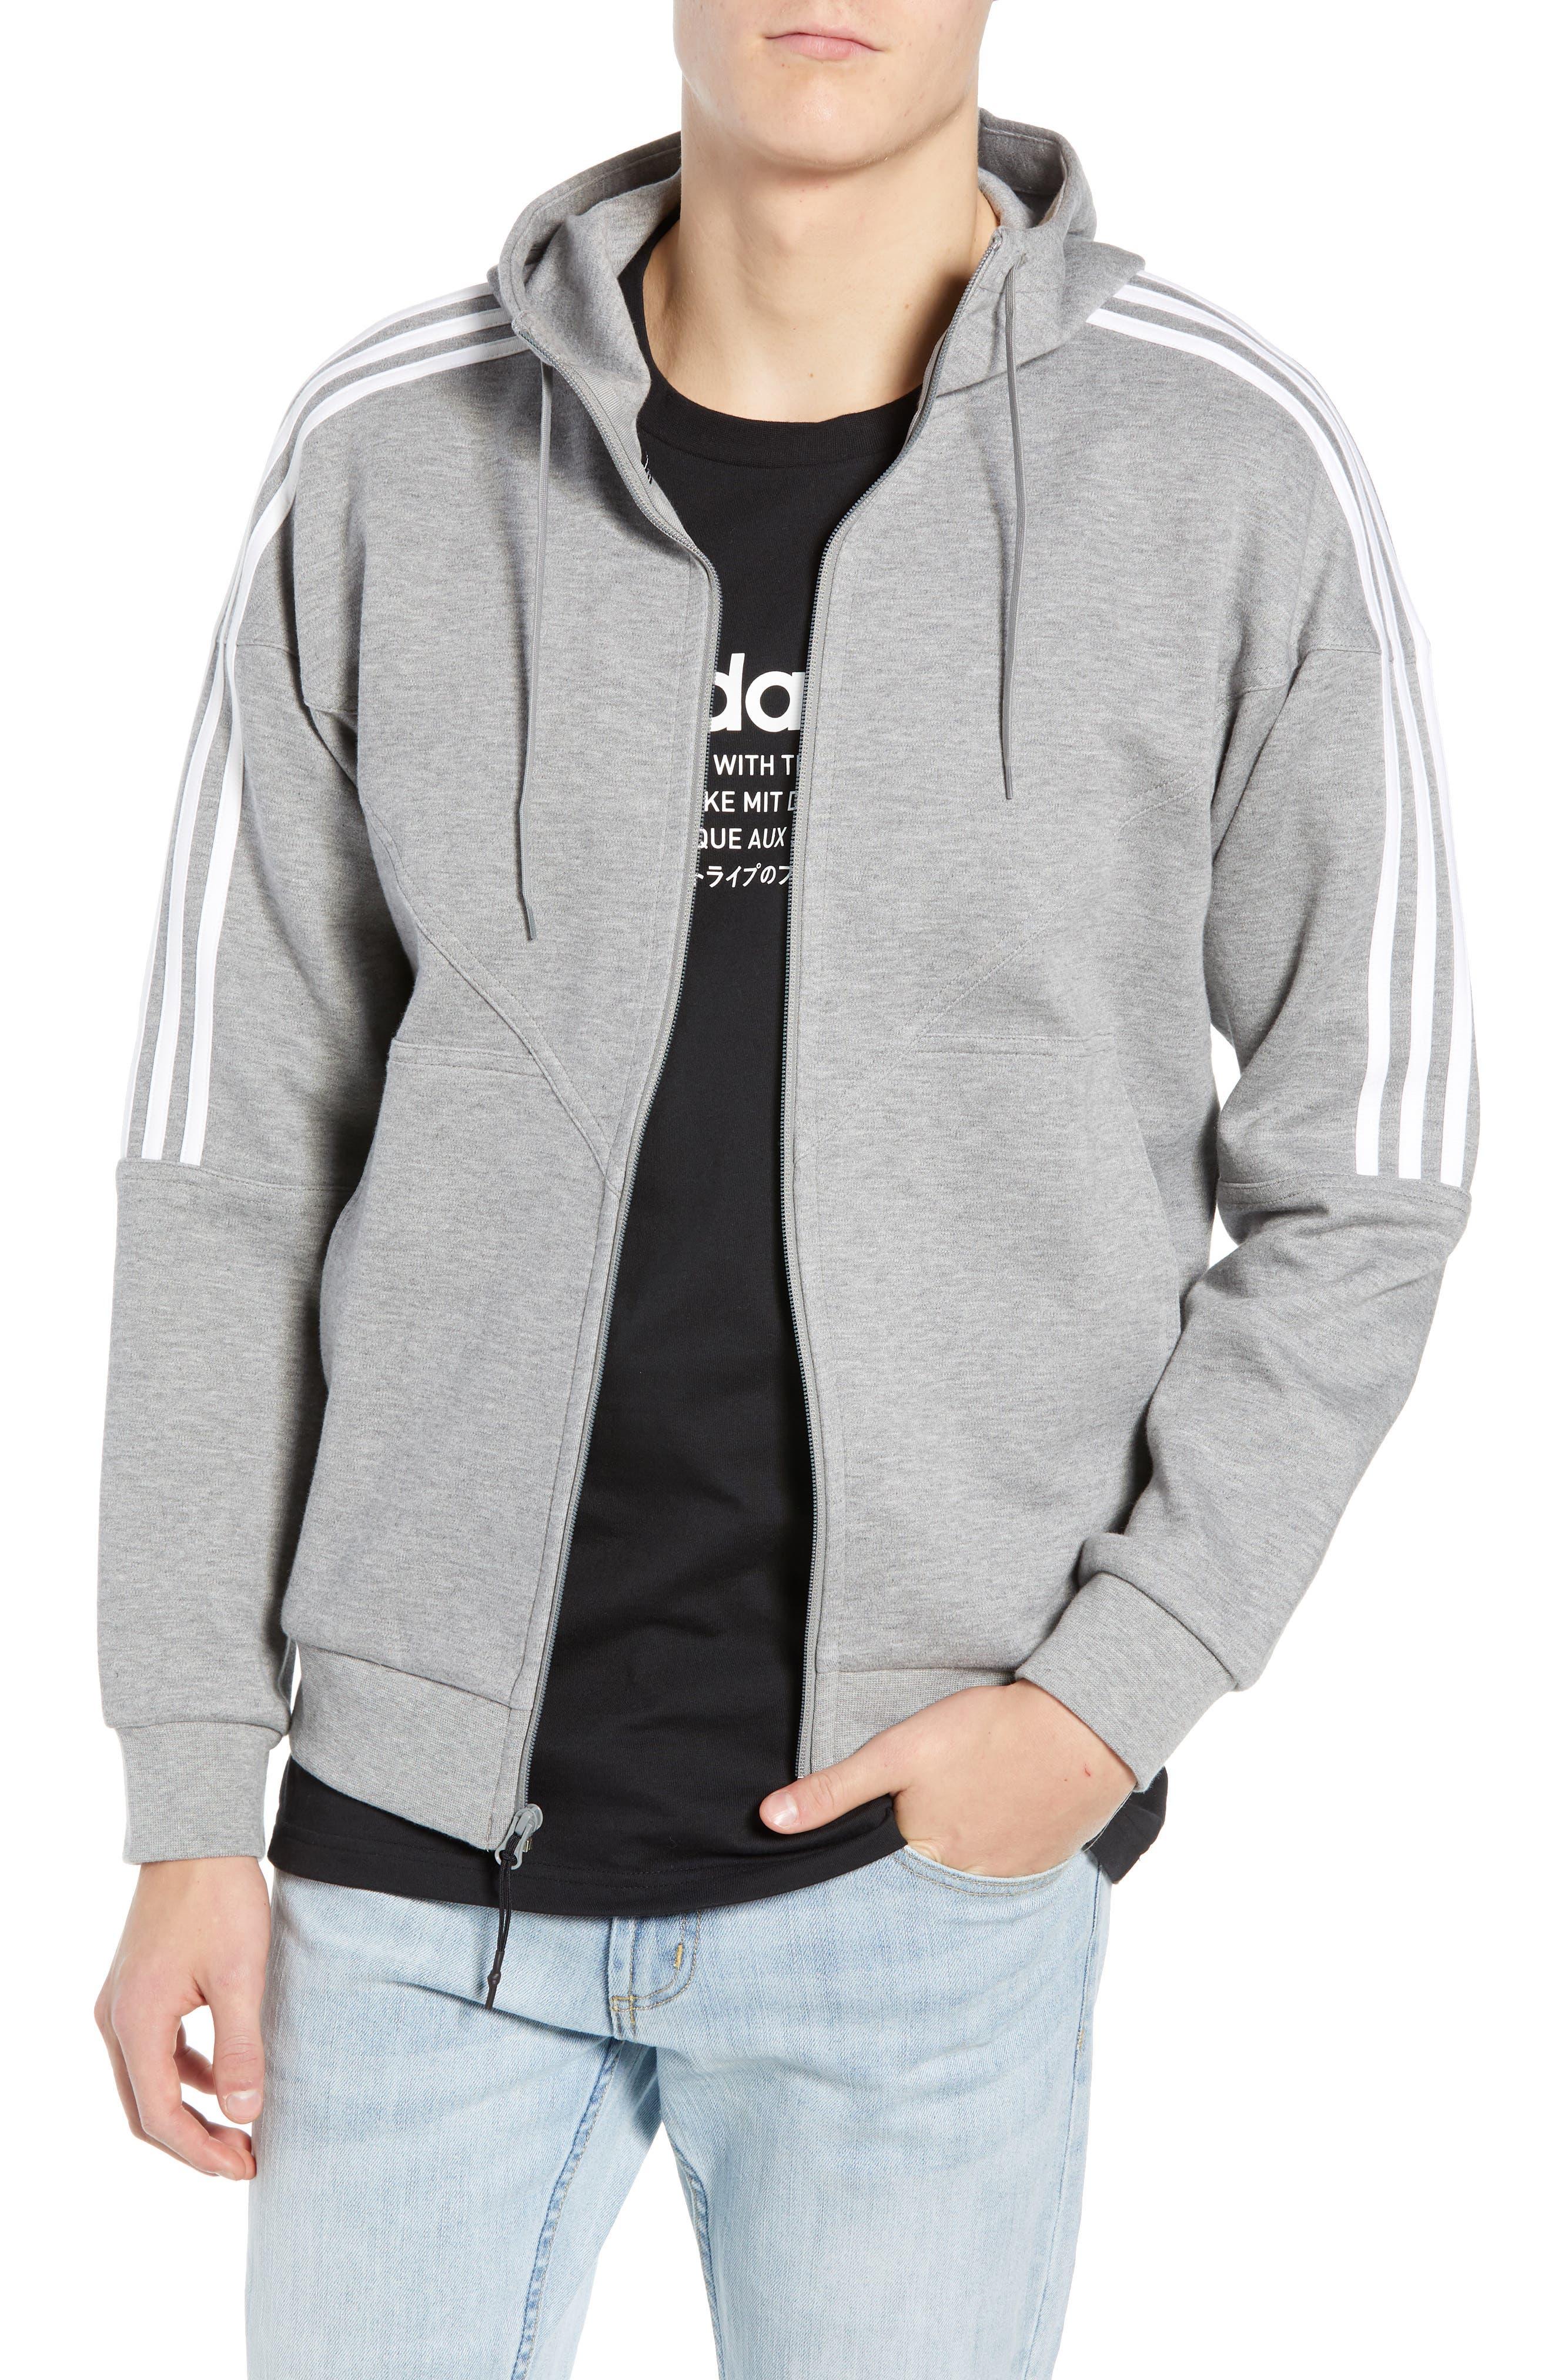 adidas NMD Zip Hoodie,                         Main,                         color, MED GREY HEATHER